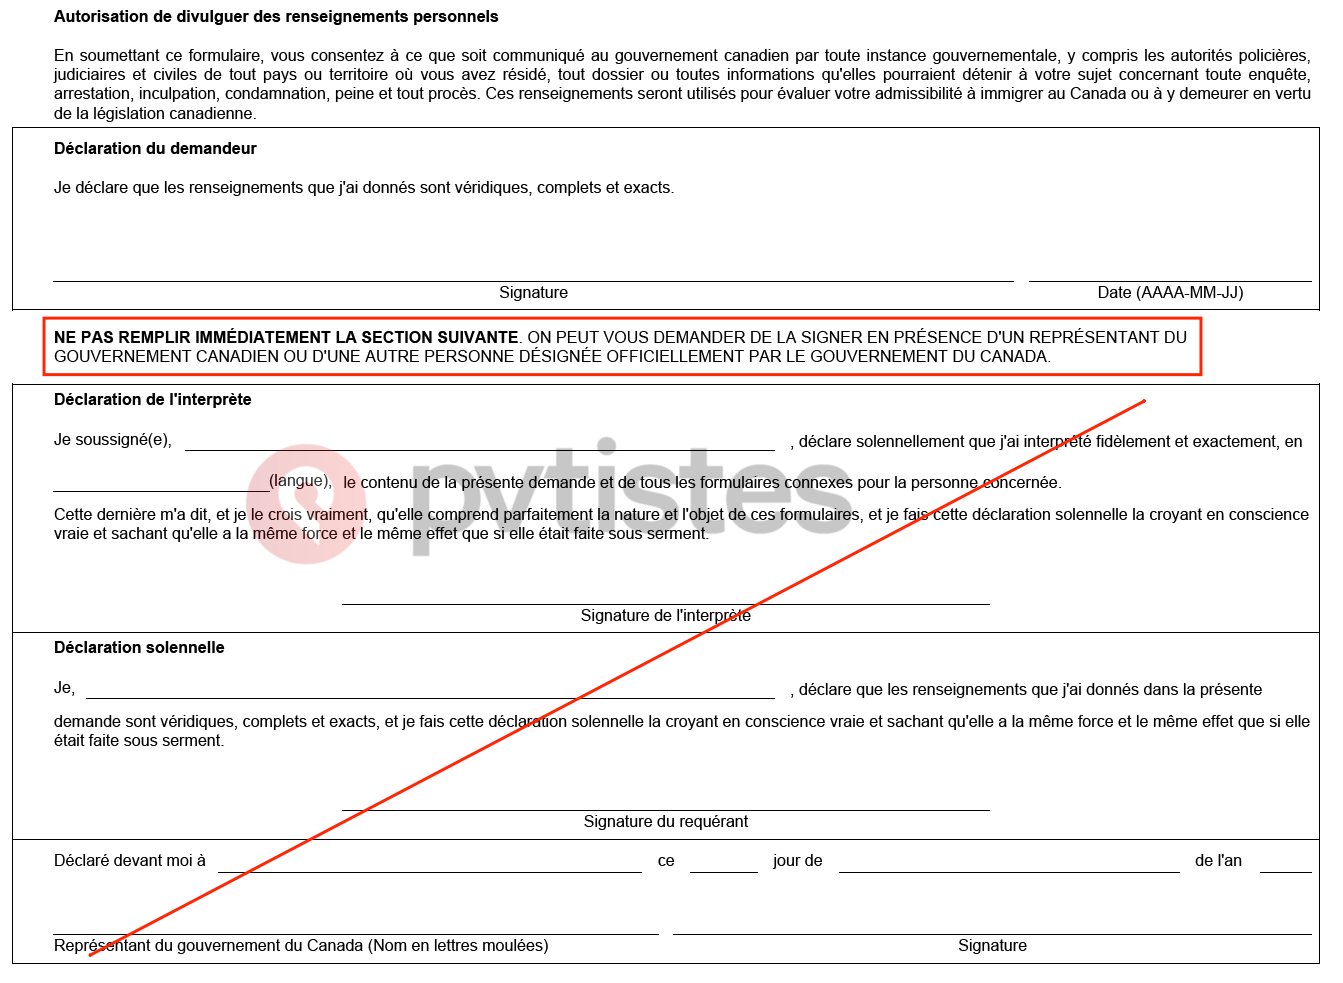 toriel Residence Permanente Canada - Federal 16